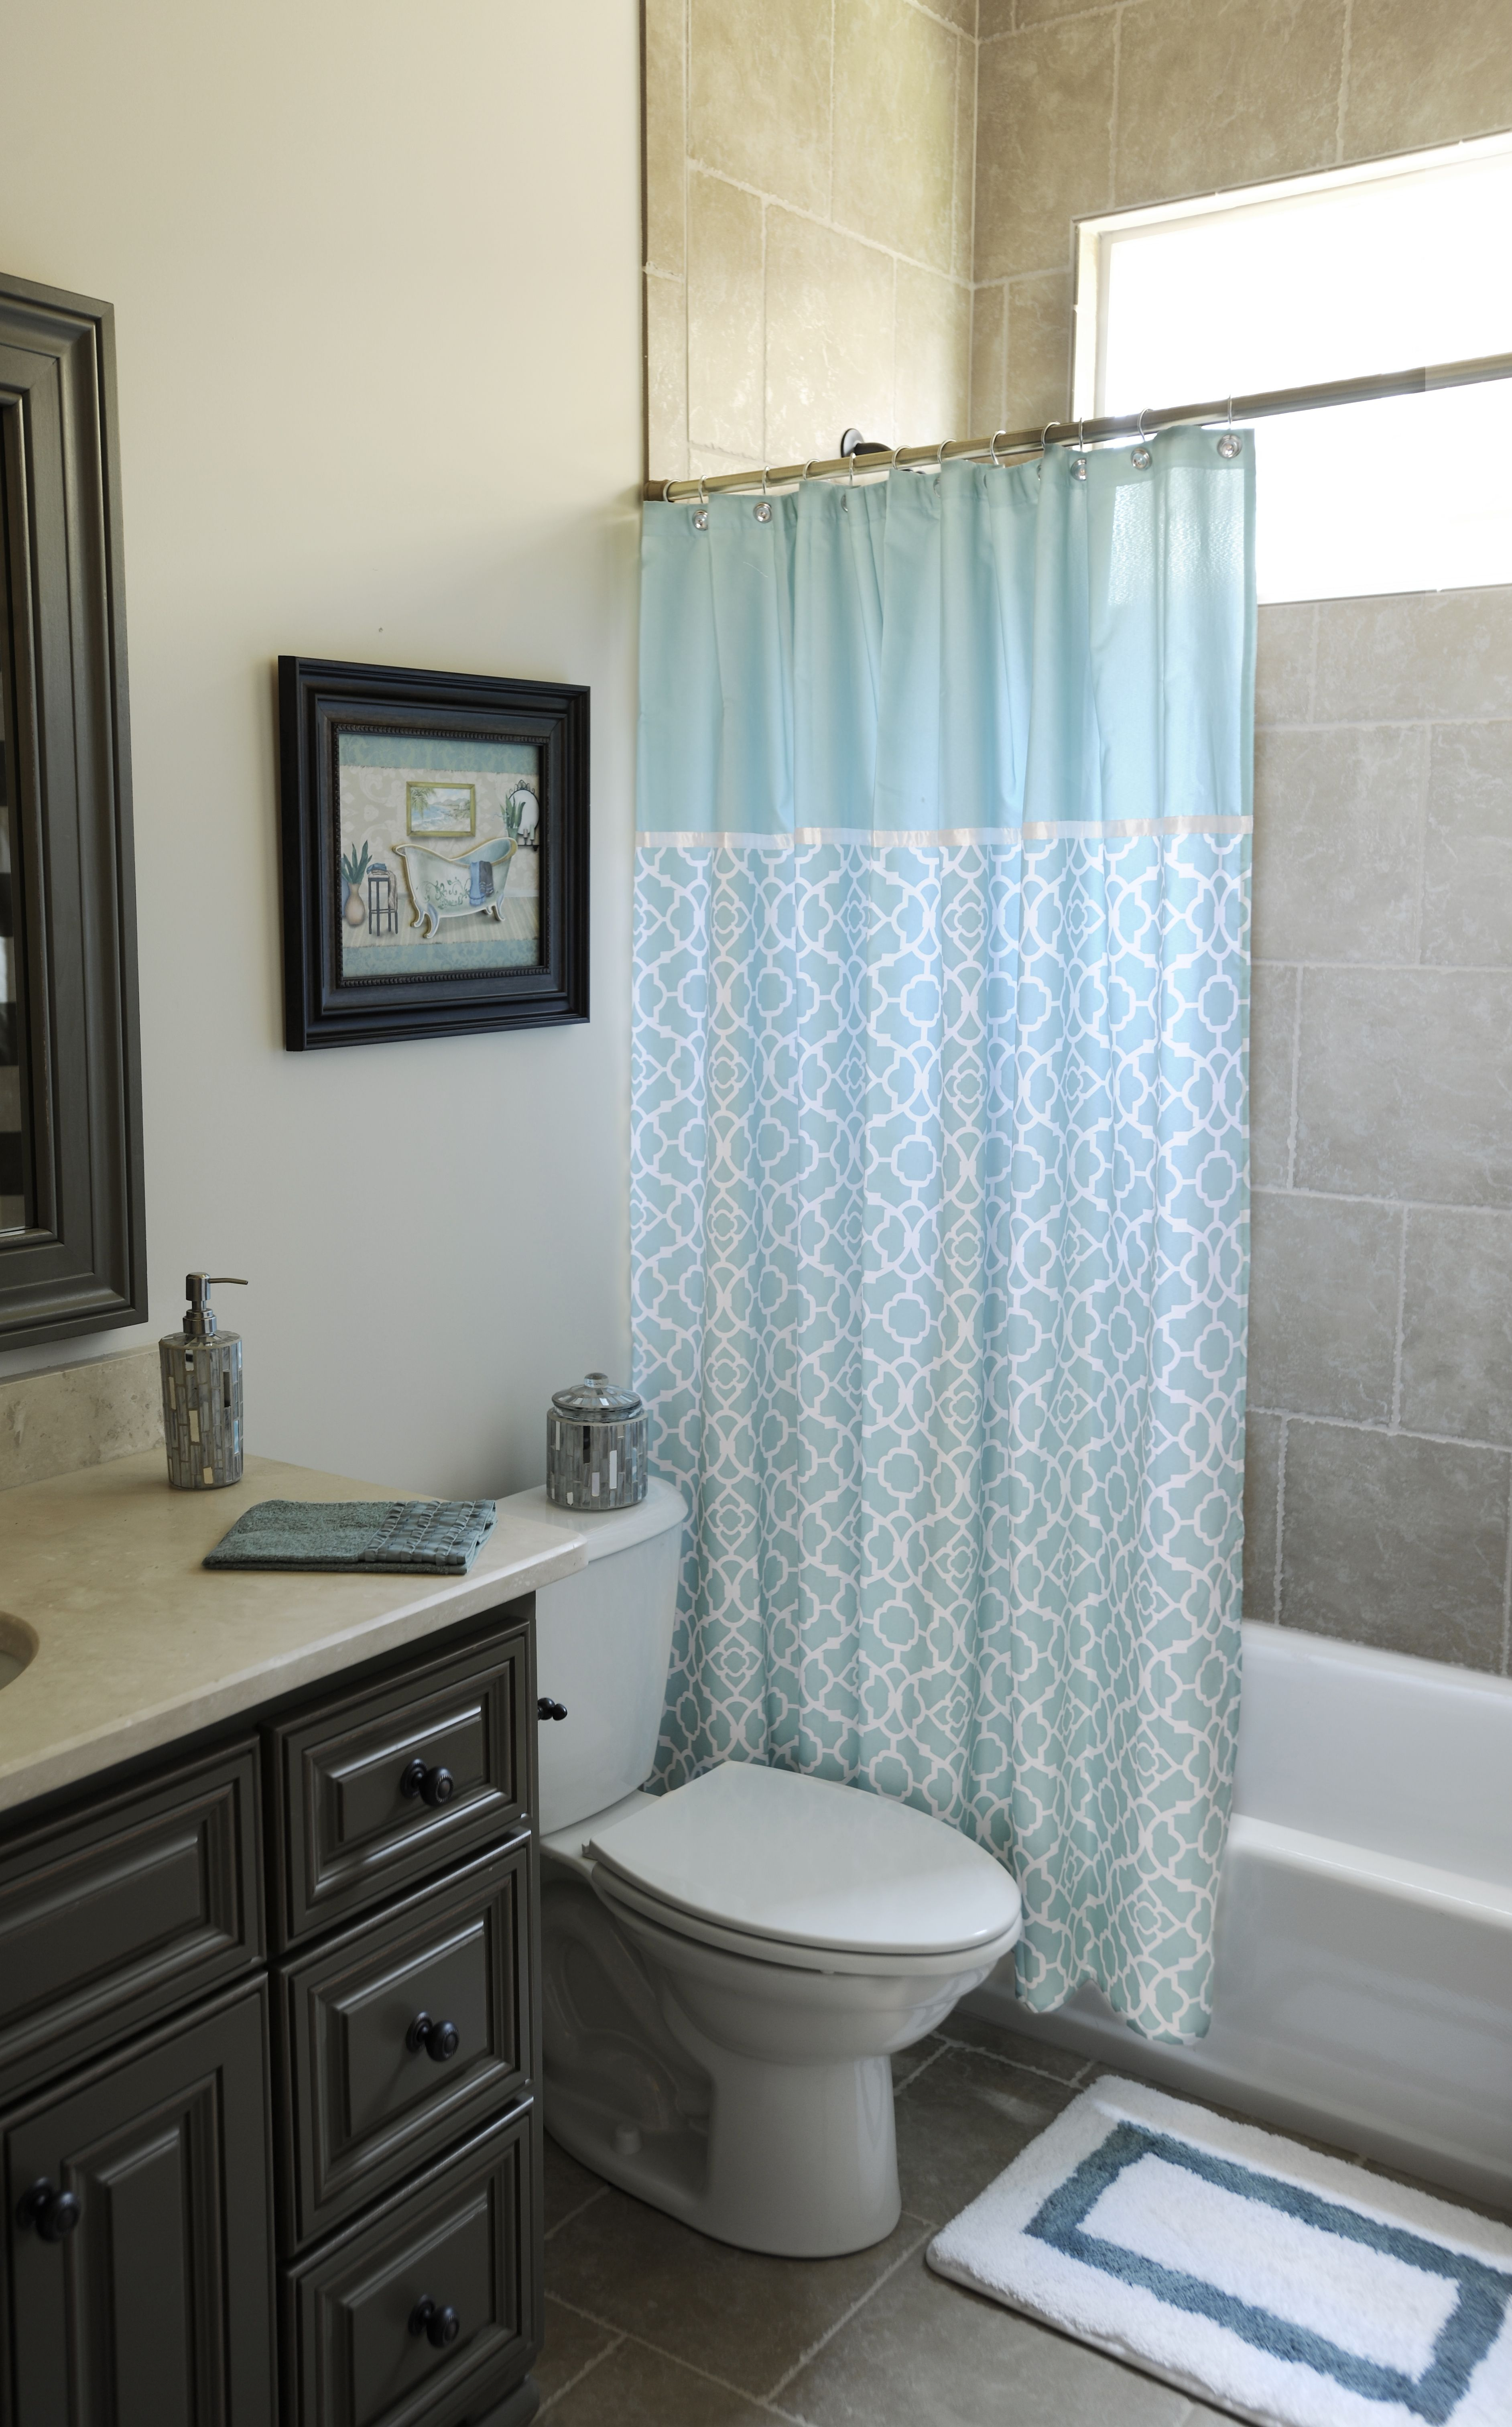 Aqua blue shower curtain bath blue shower curtains and for Bathroom decor kirklands